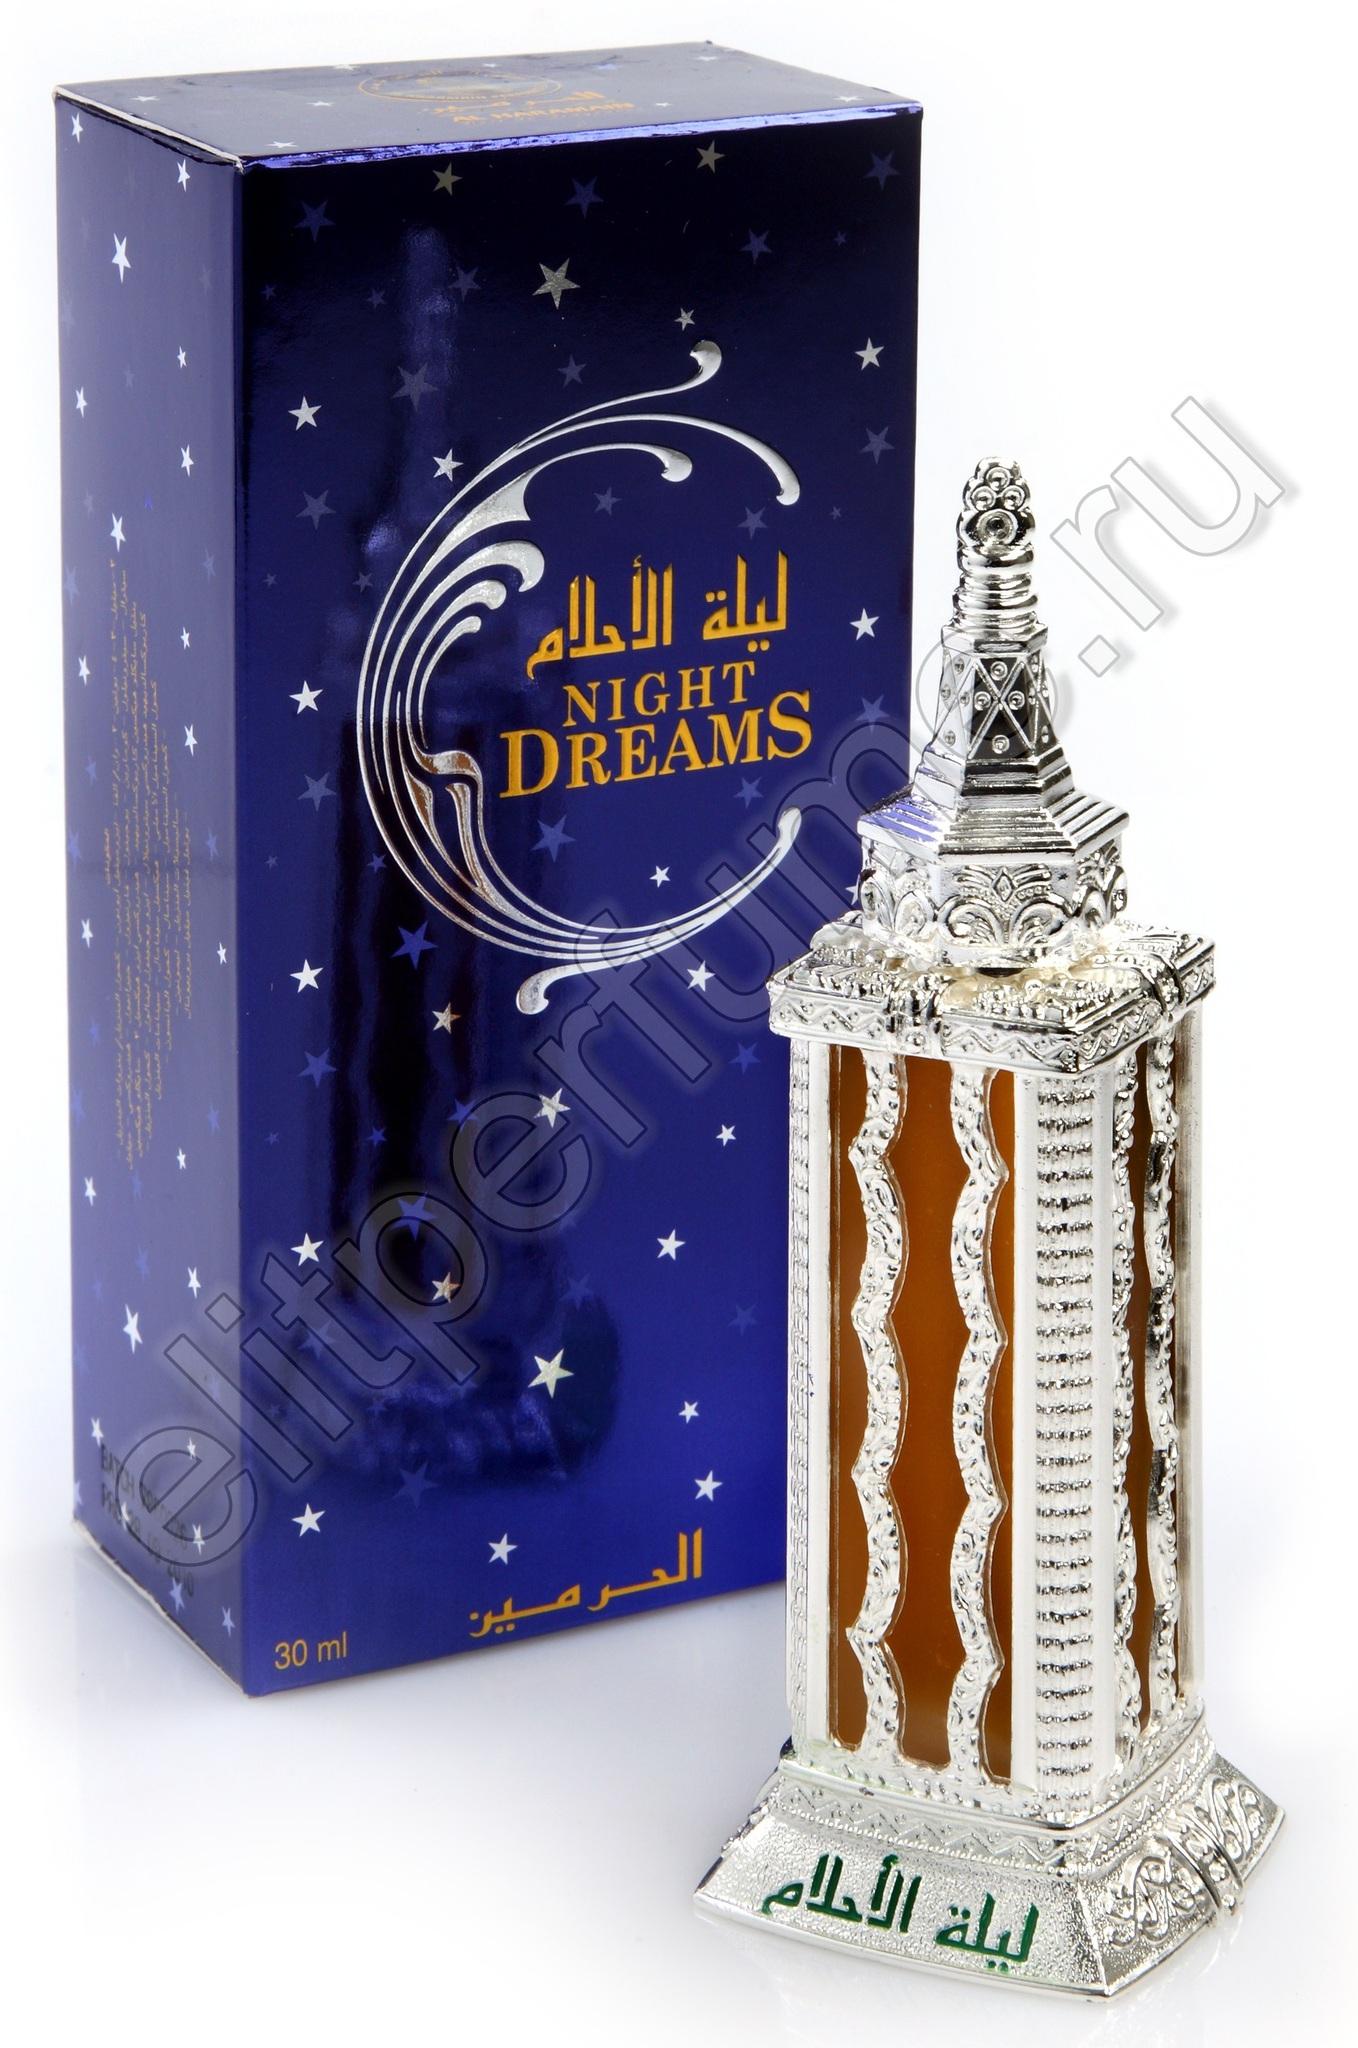 Ночные Сны Night Dreams 30 мл арабские масляные духи от Аль Харамайн Al Haramain Perfumes